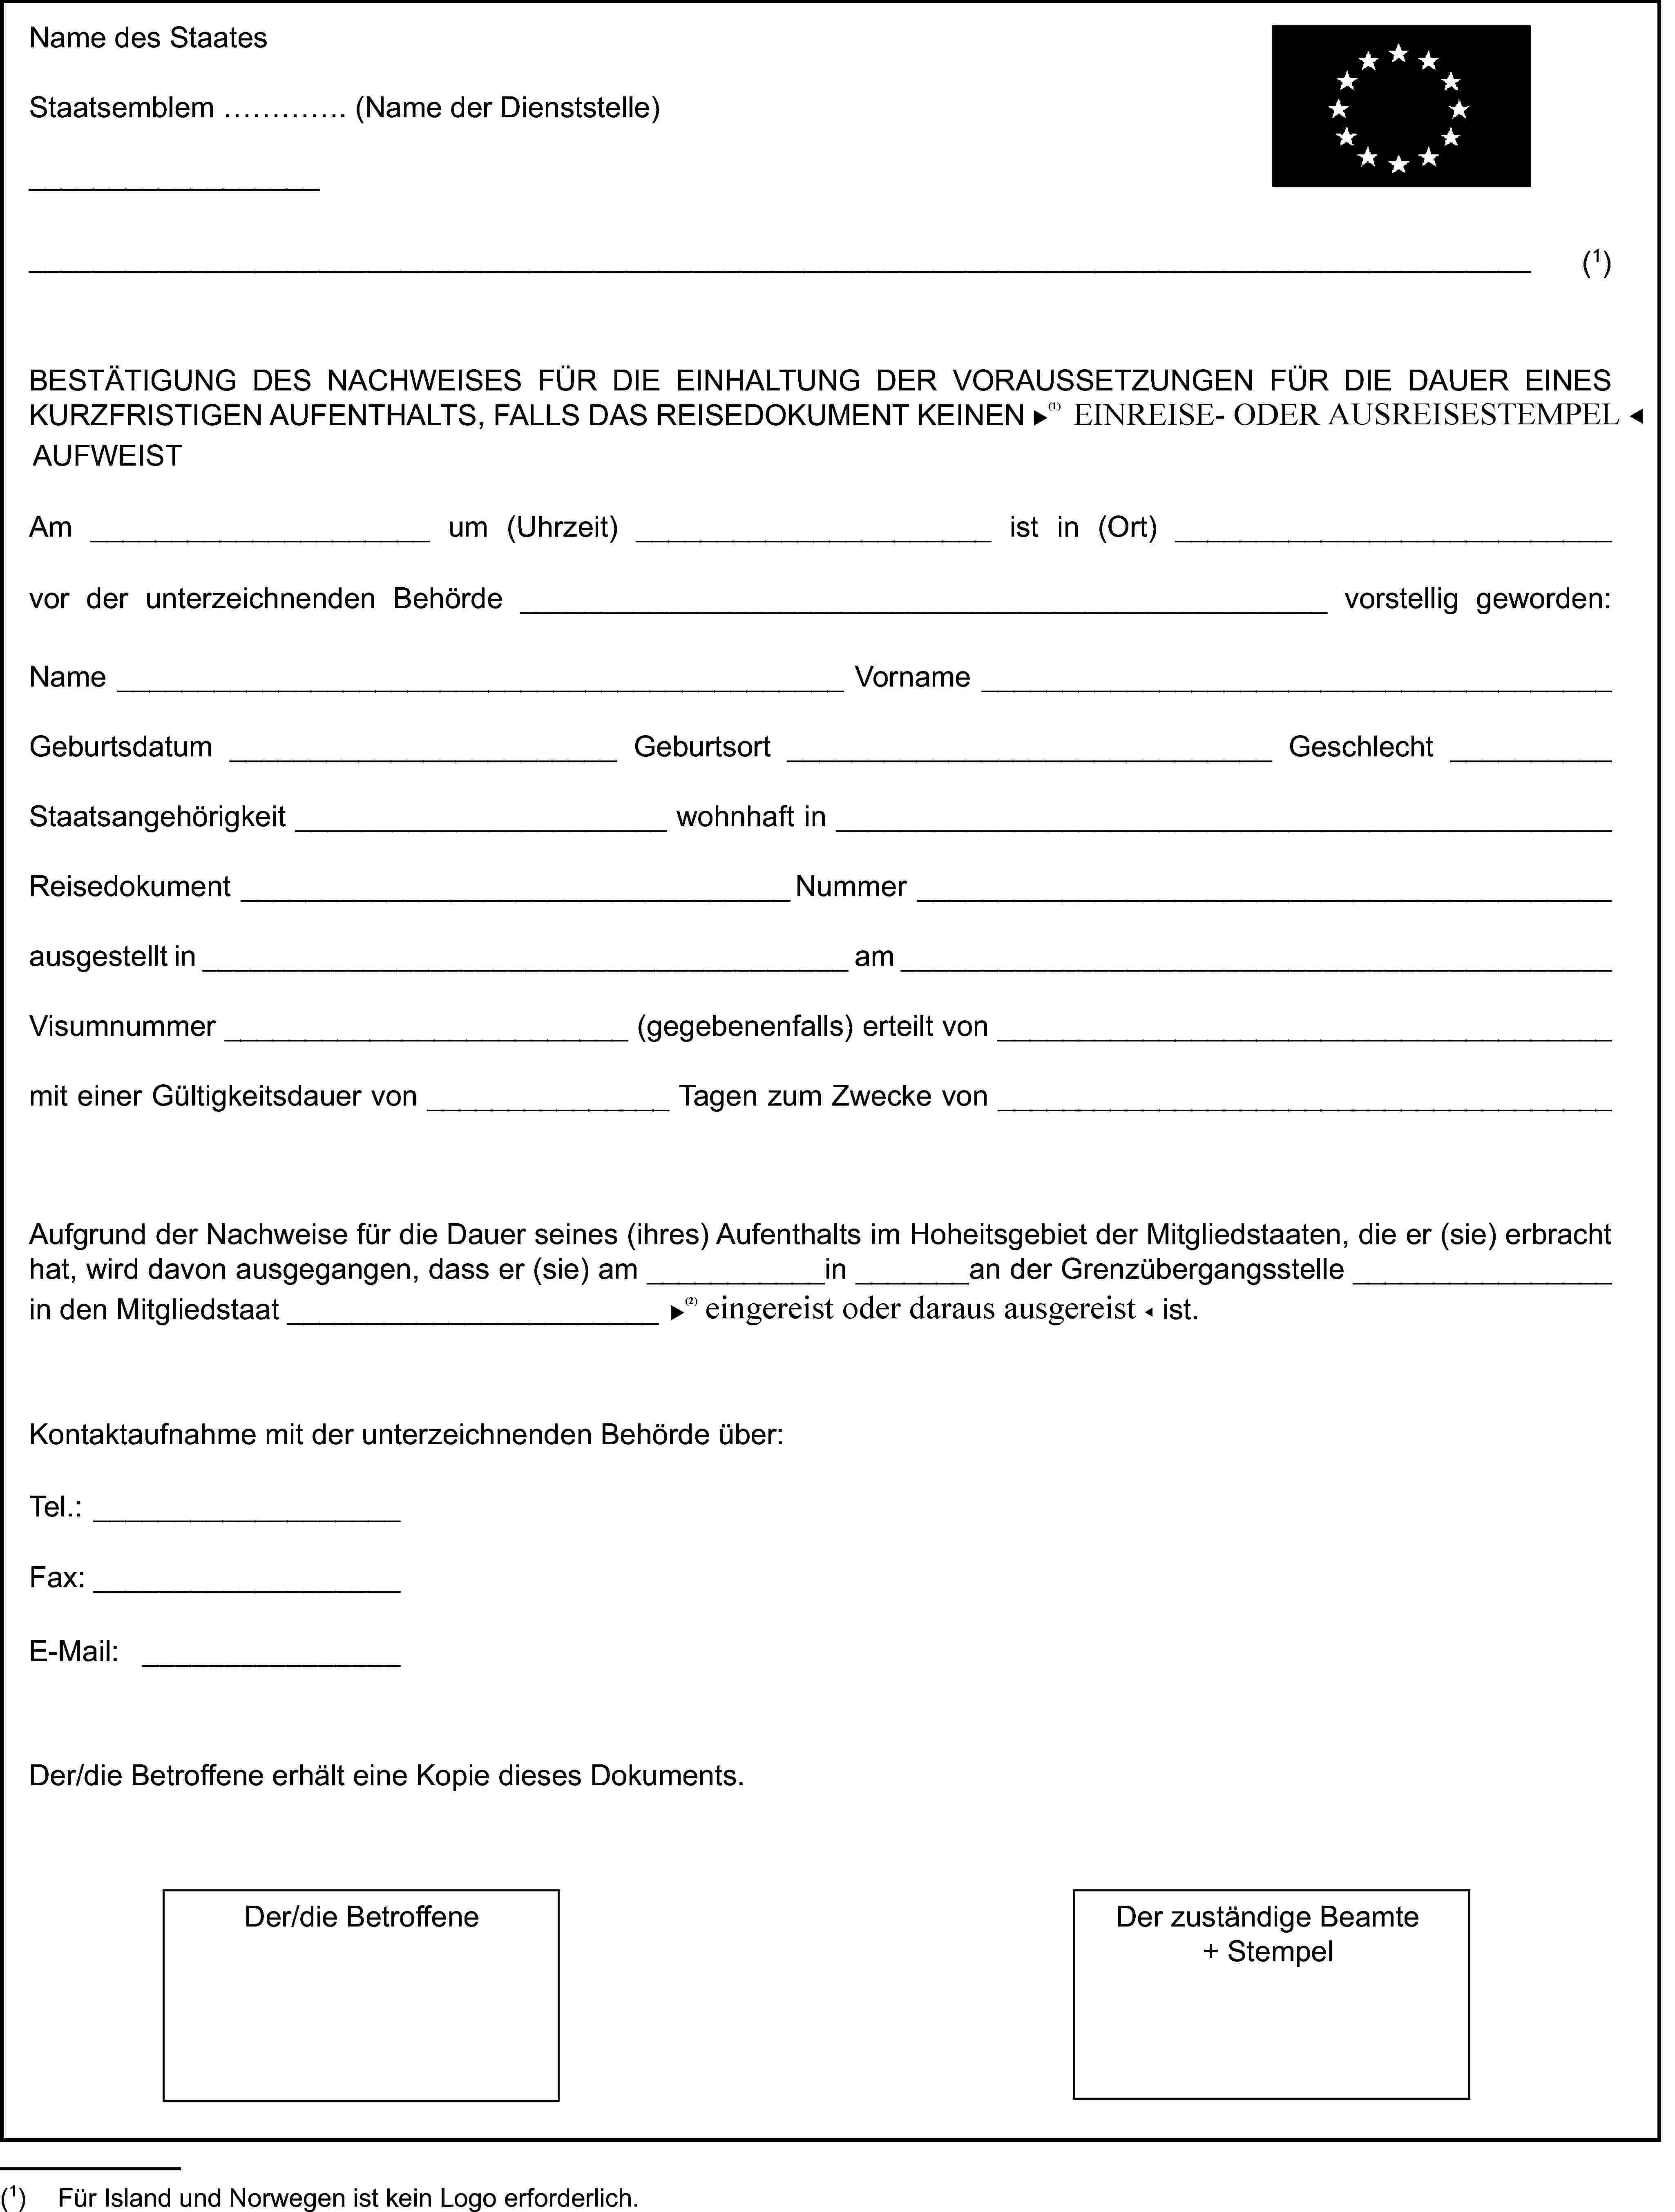 eur lex 02006r0562 20131018 en eur lex - Asylantrag Muster